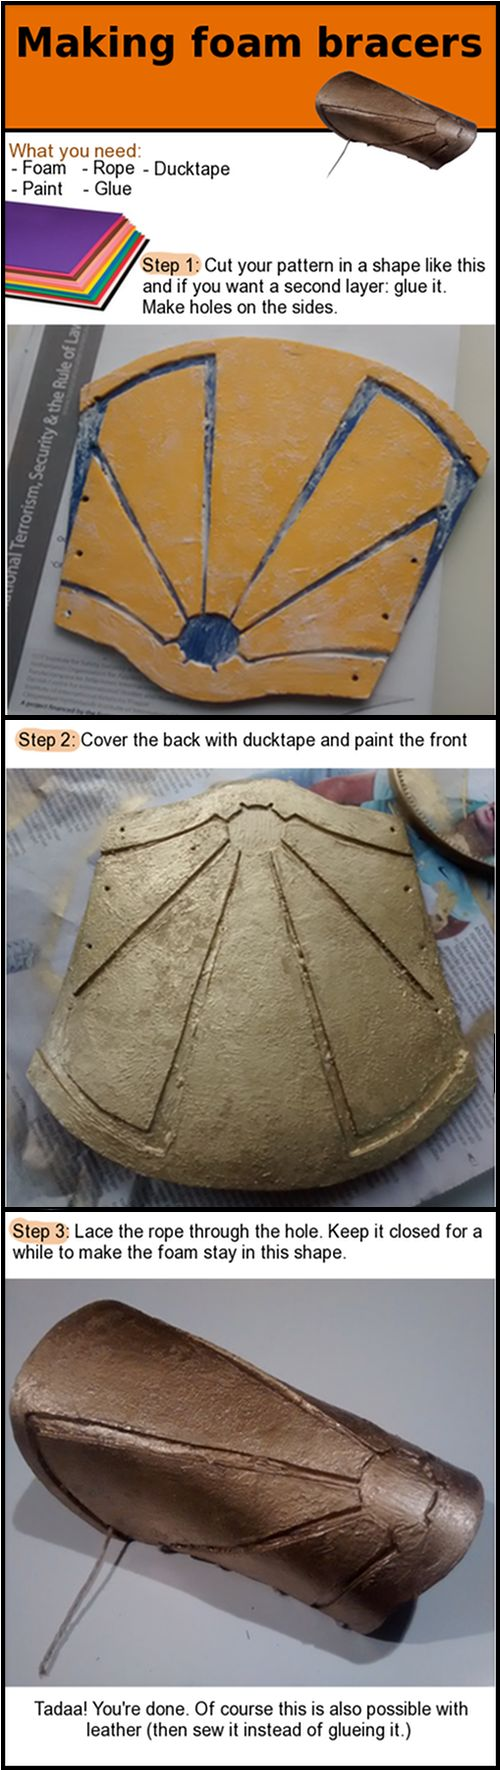 Foam Bracers tutorial for LARP or Cosplay